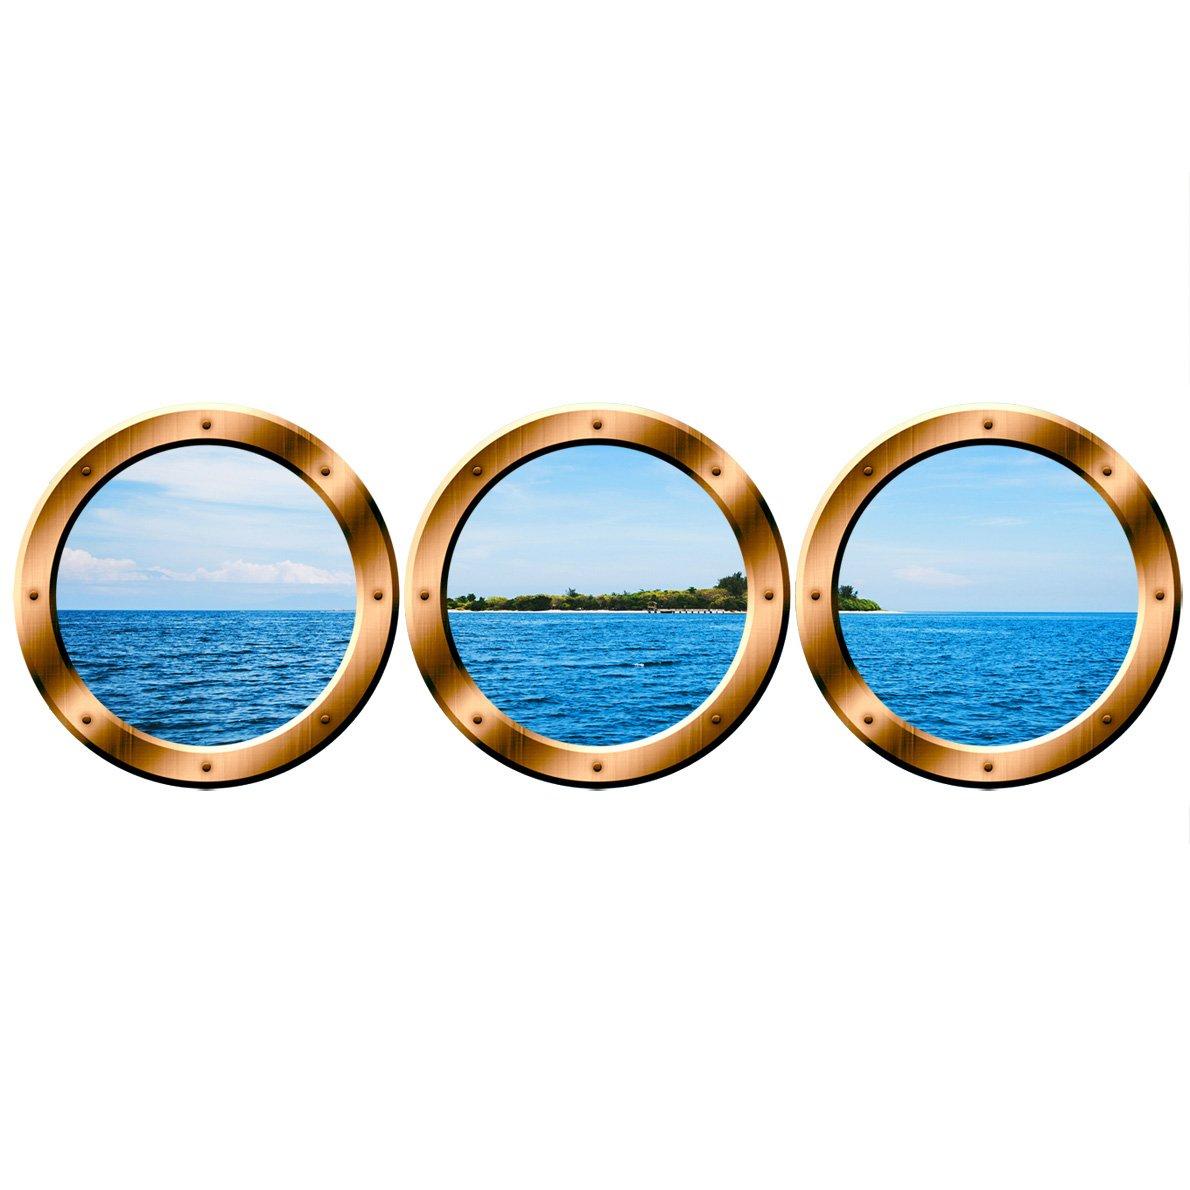 VWAQ Scenic Ocean Sticker/PORTHOLES - Tropical Island Wall Decor SPW4 (20'' Variation, Bronze)